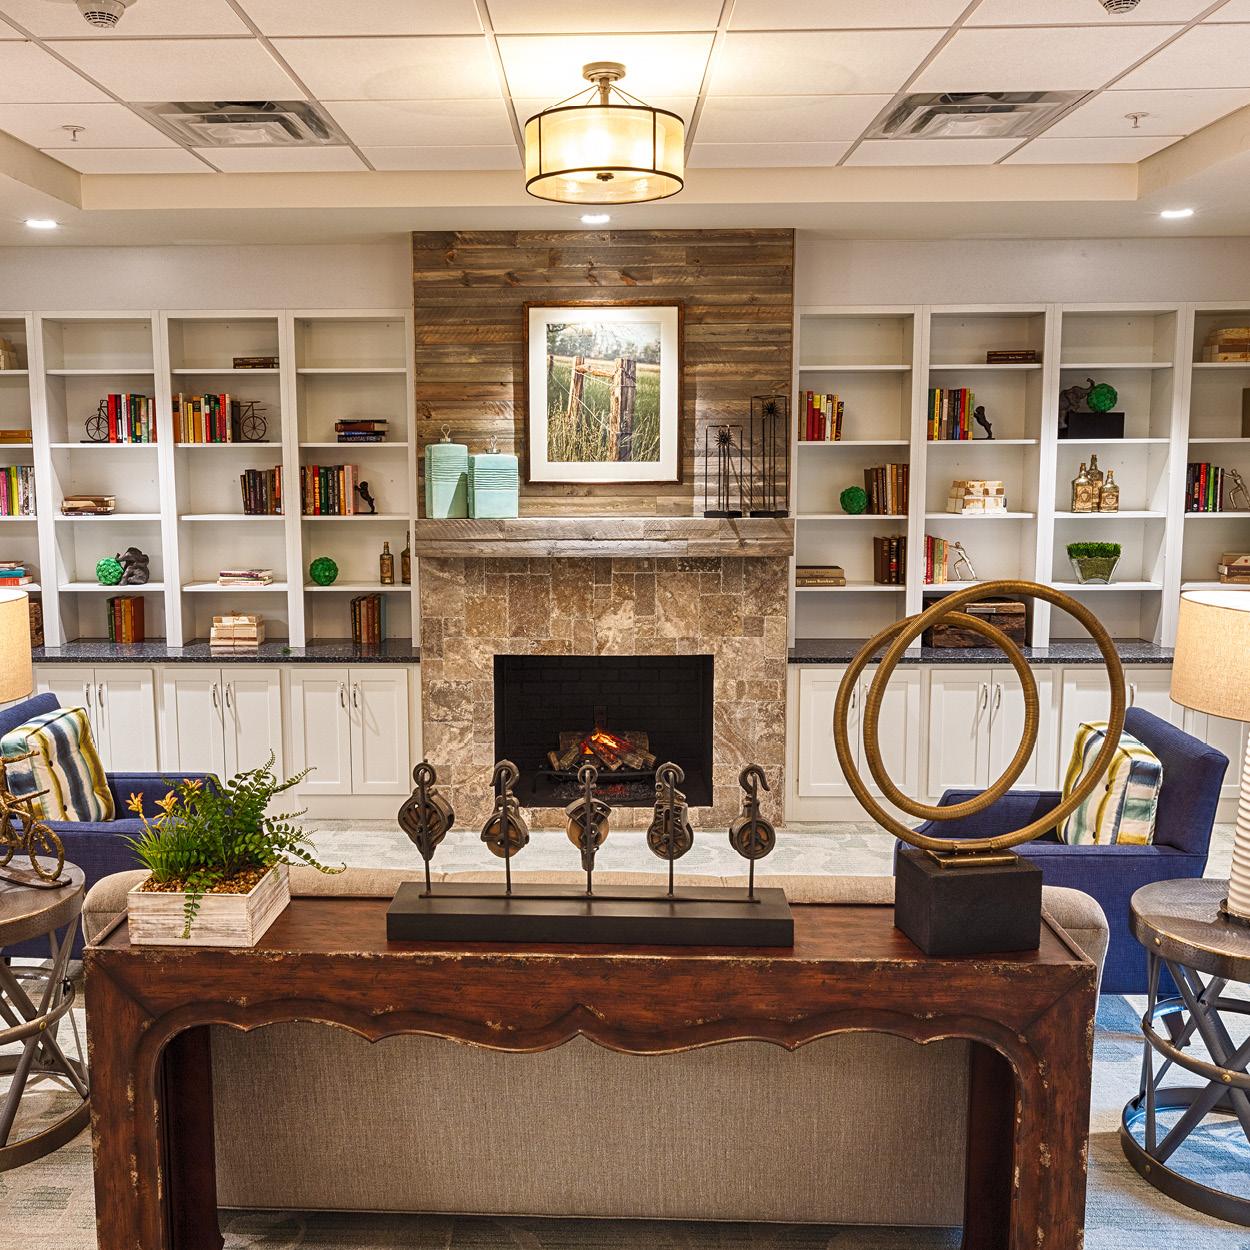 Sitting room at Stonerise Charleston with fireplace and bookshelves